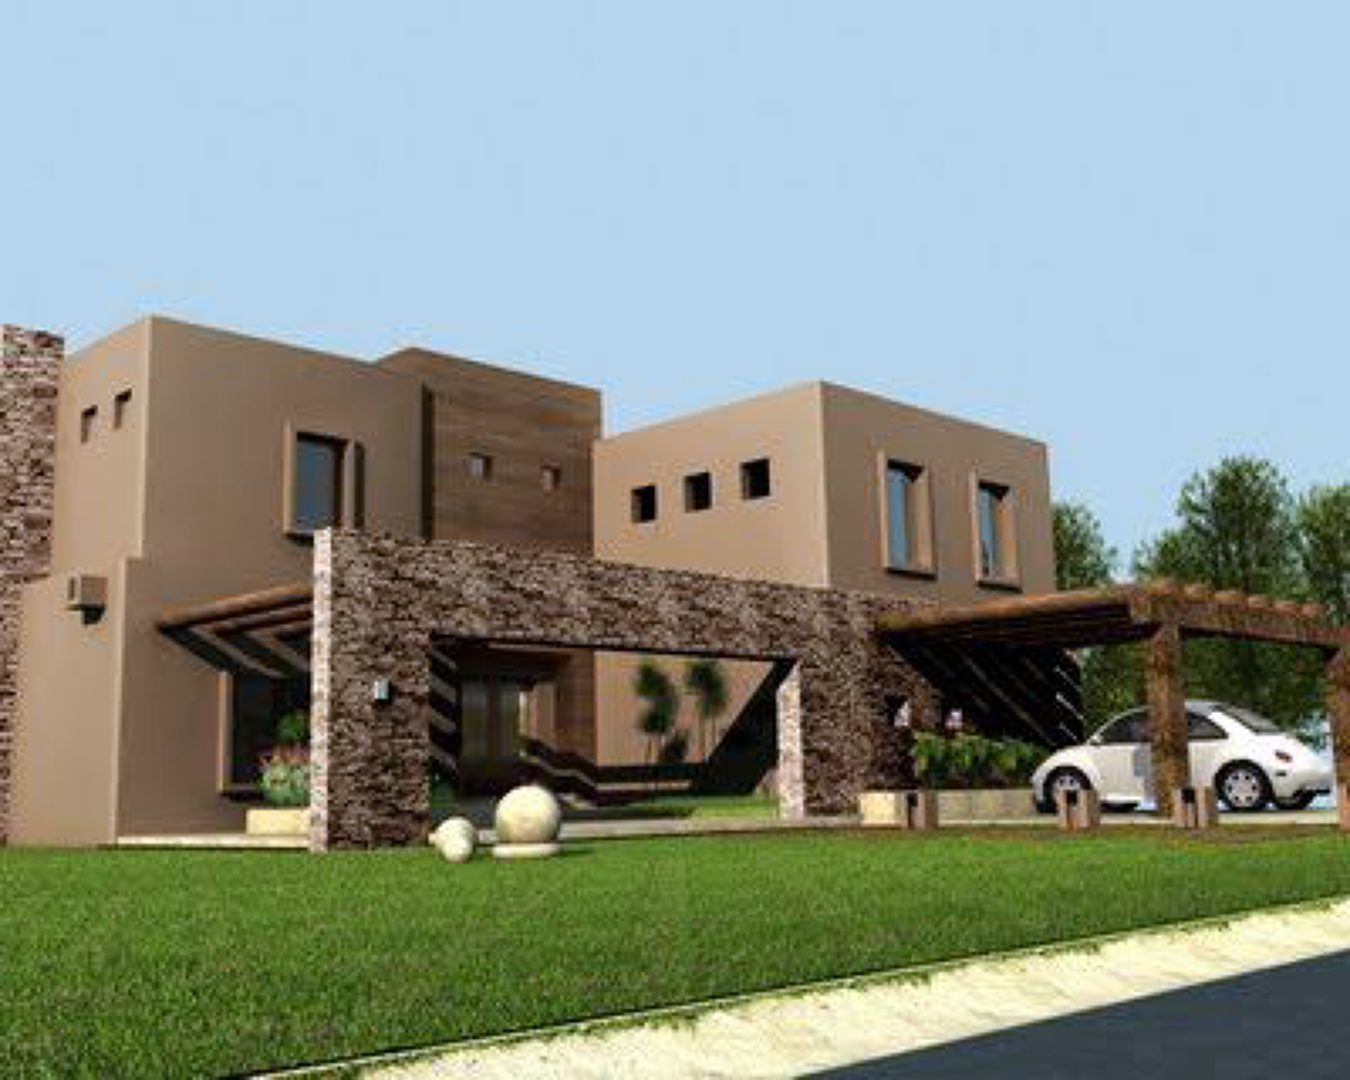 Casa moderna architecture design pinterest casas for Casas modernas acogedoras